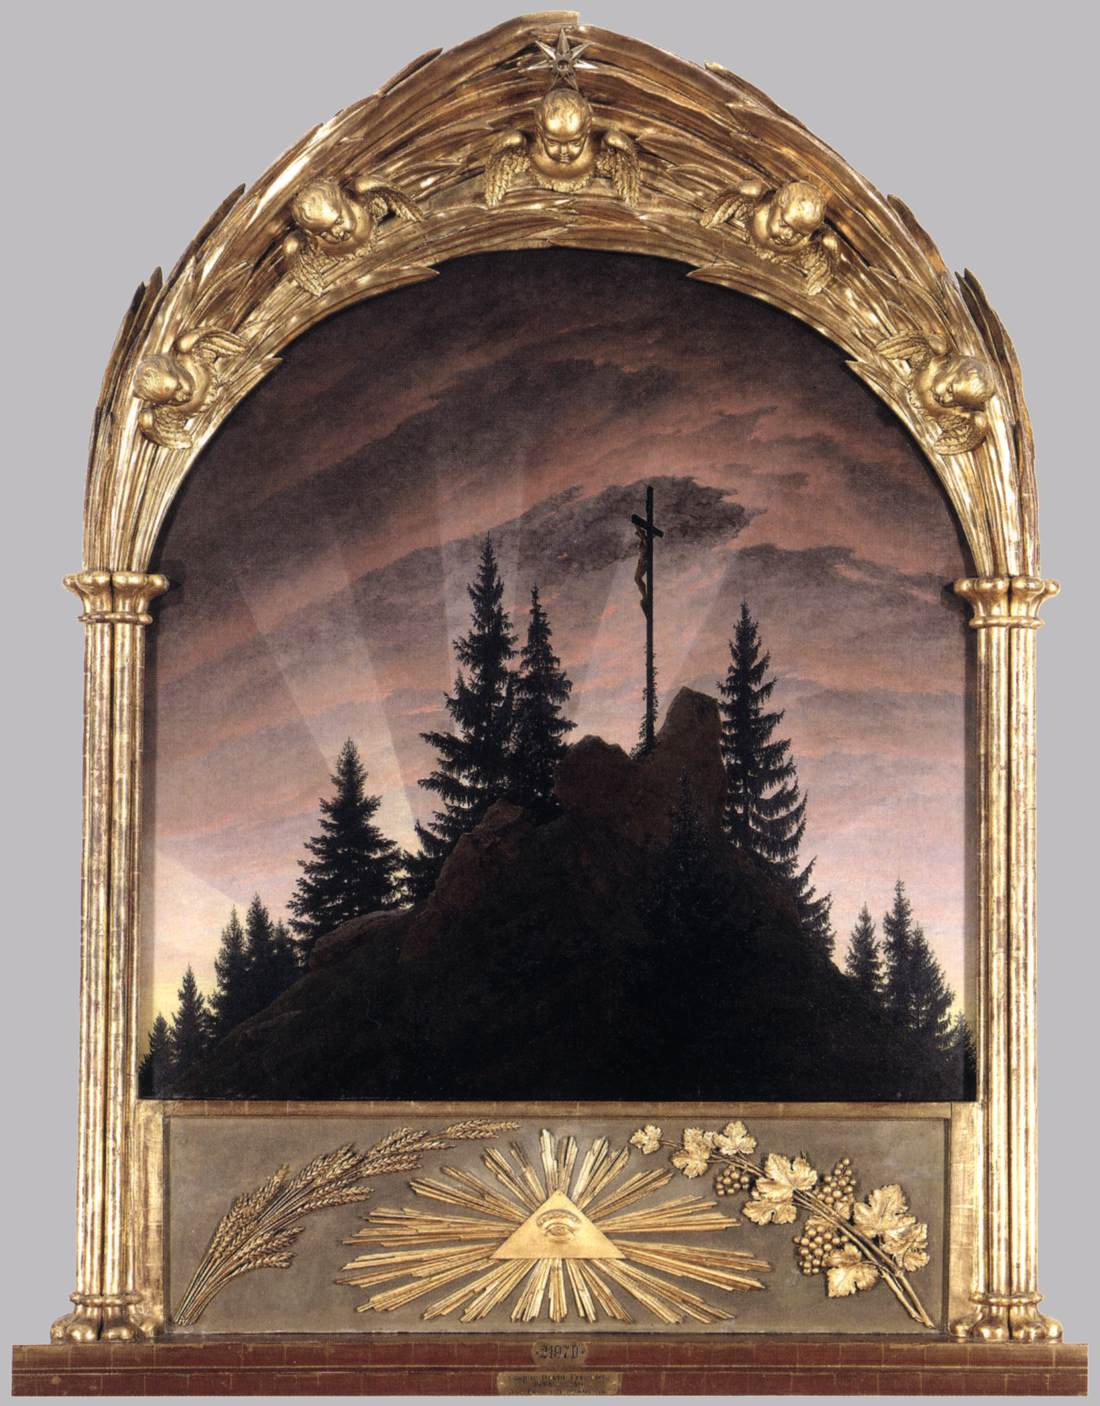 Caspar David Friedrich  Cross in the Mountains (Tetschen Altar),  1808 Oil on canvas, 115 x 110 cm Gemäldegalerie, Dresden